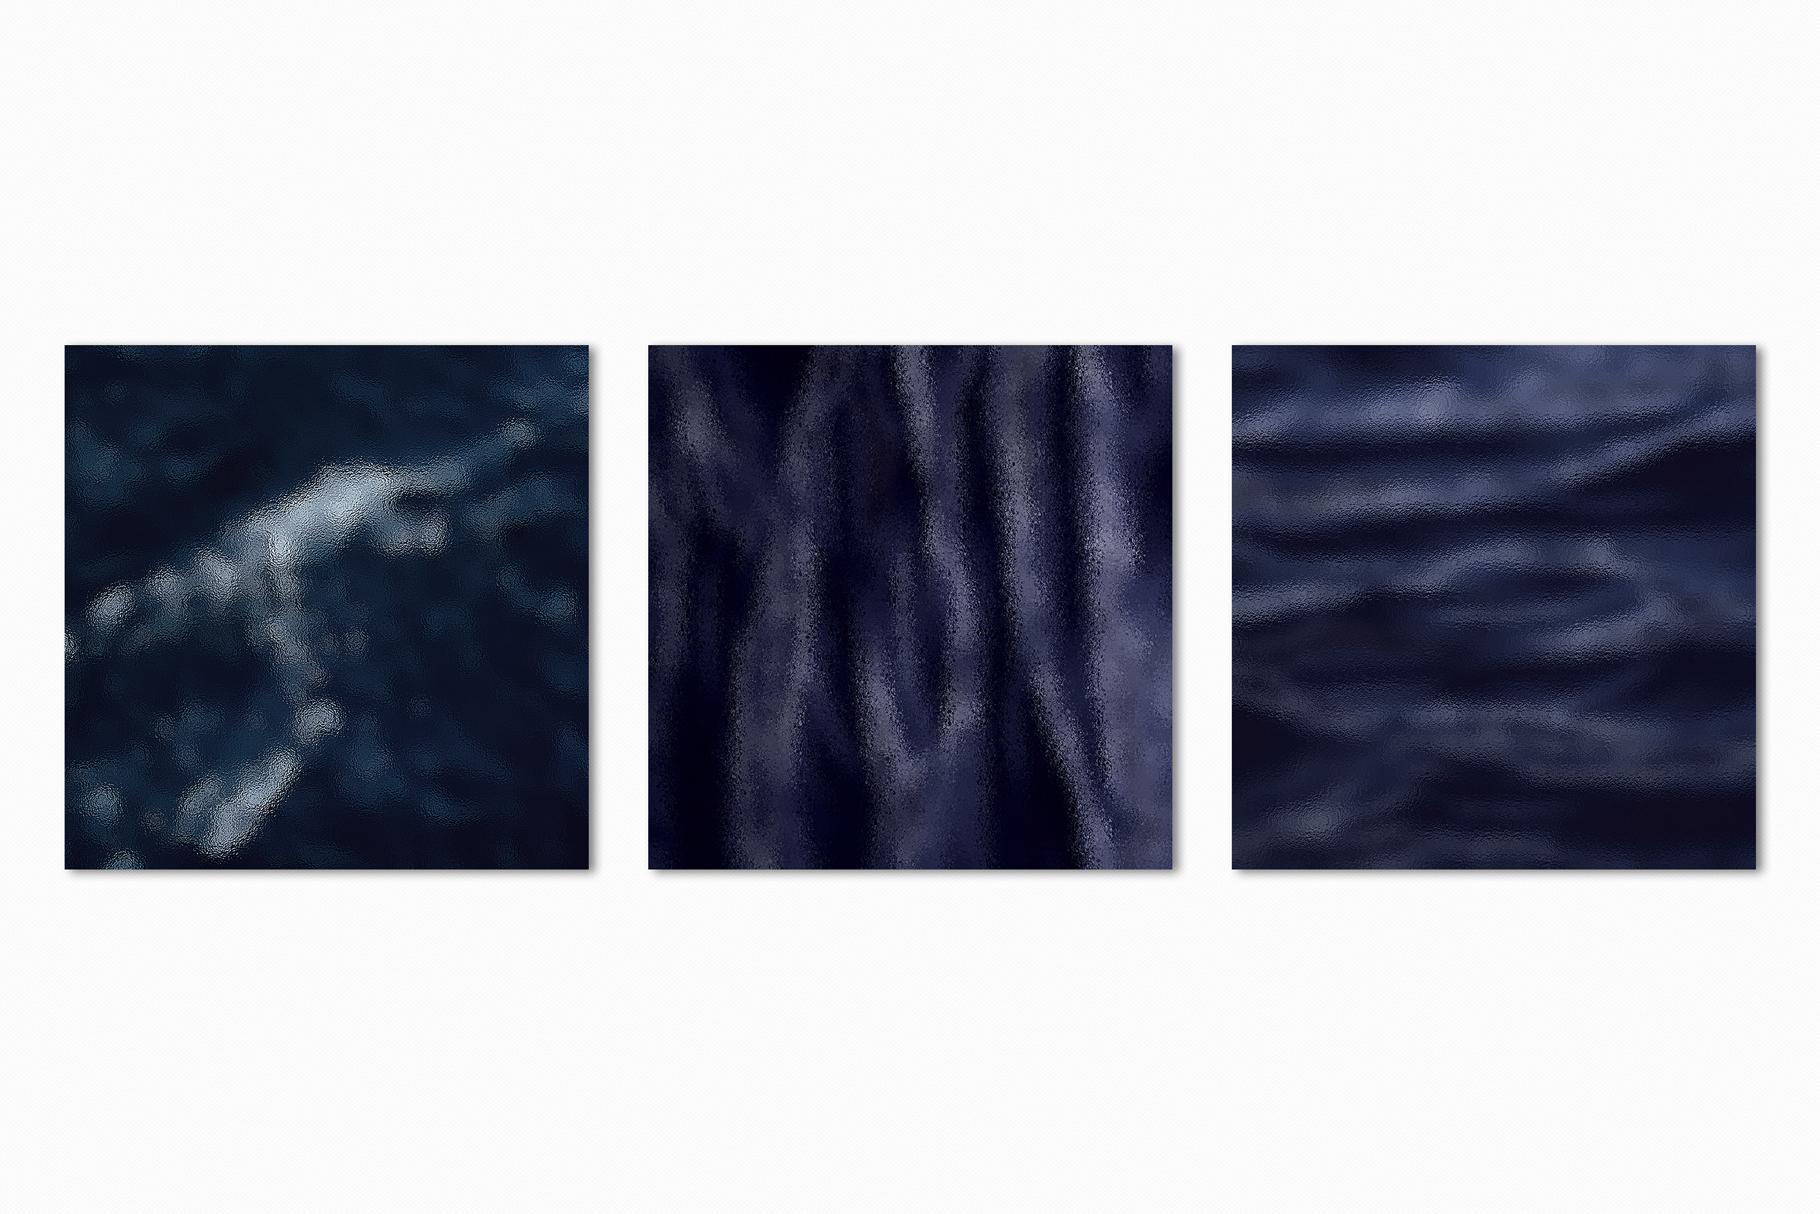 Dark Metallic Textures - 15 Foil & Glitter Digital Papers example image 14